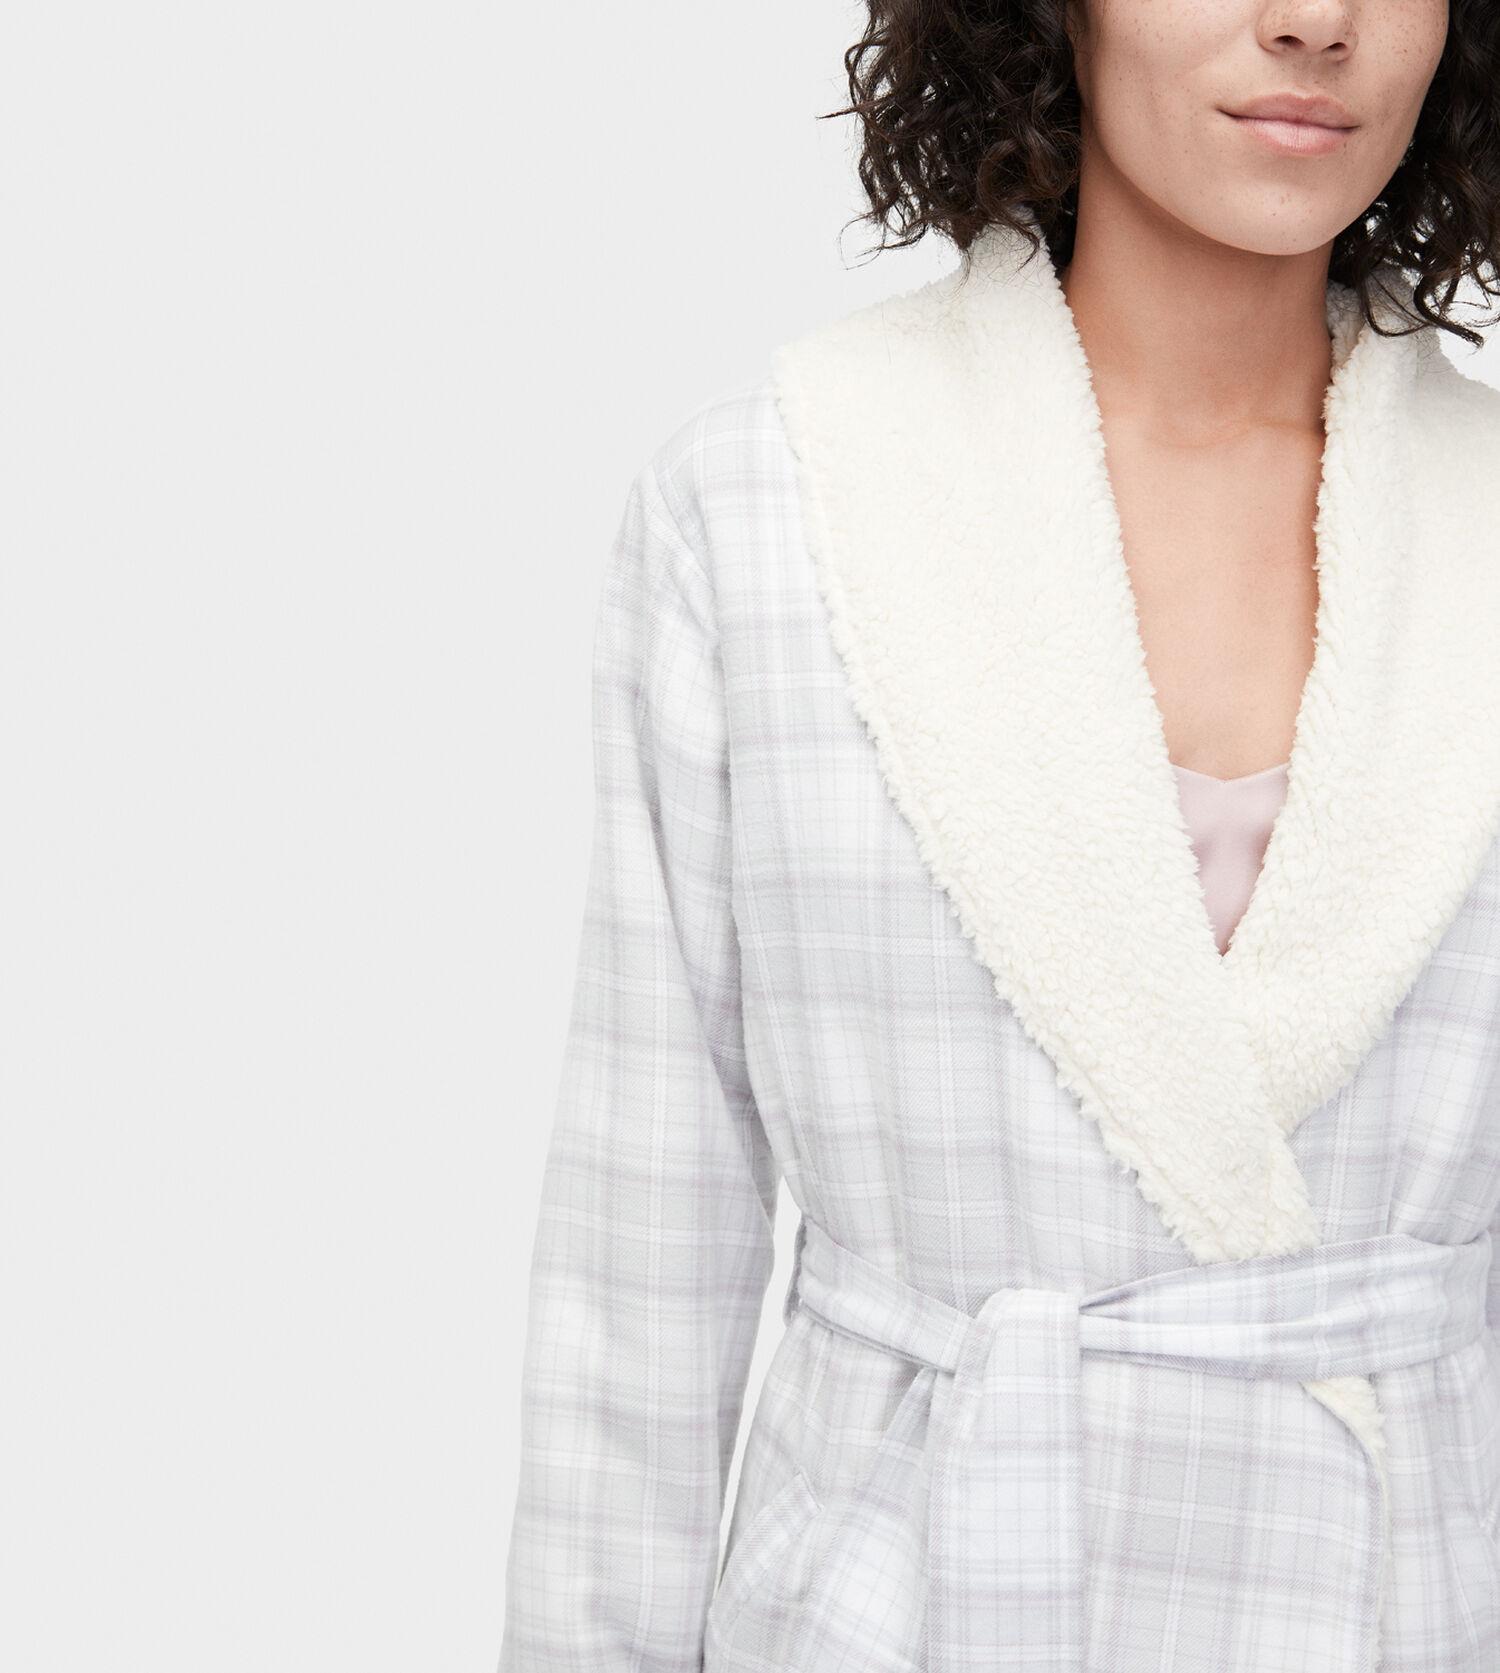 Zoom Anika Flannel Robe - Image 4 of 4 a58f942e9